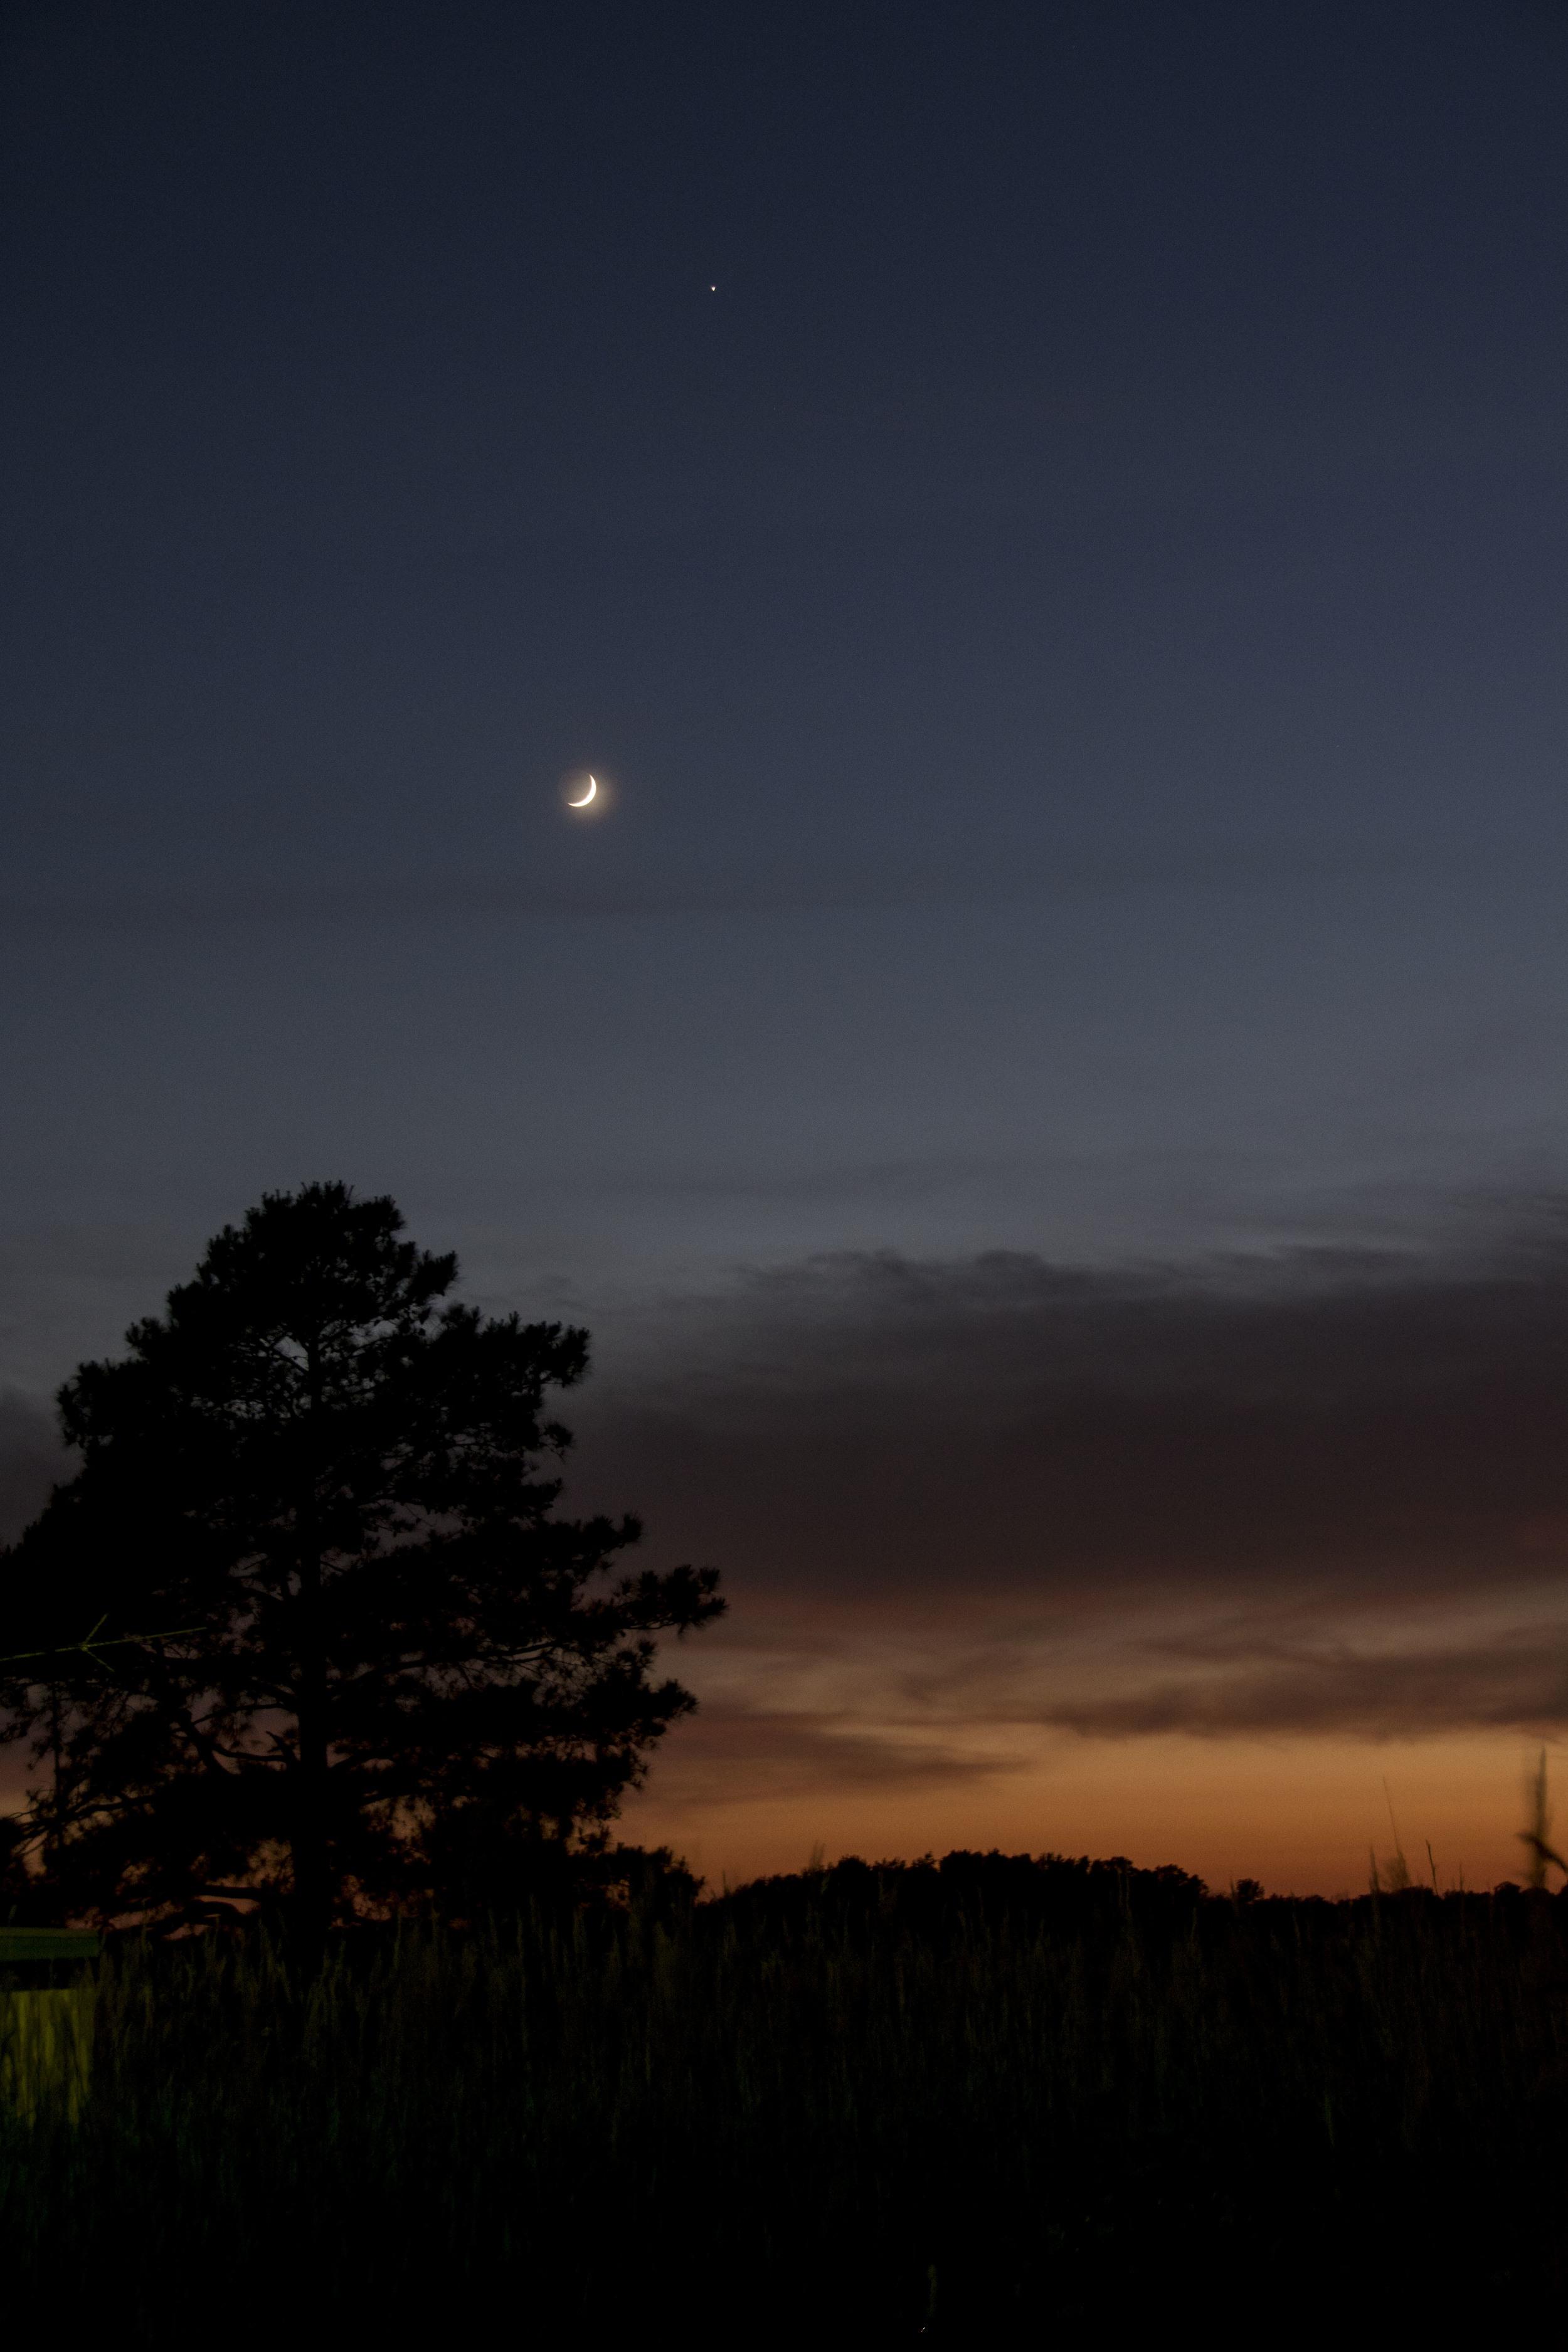 Sunset/moonrise